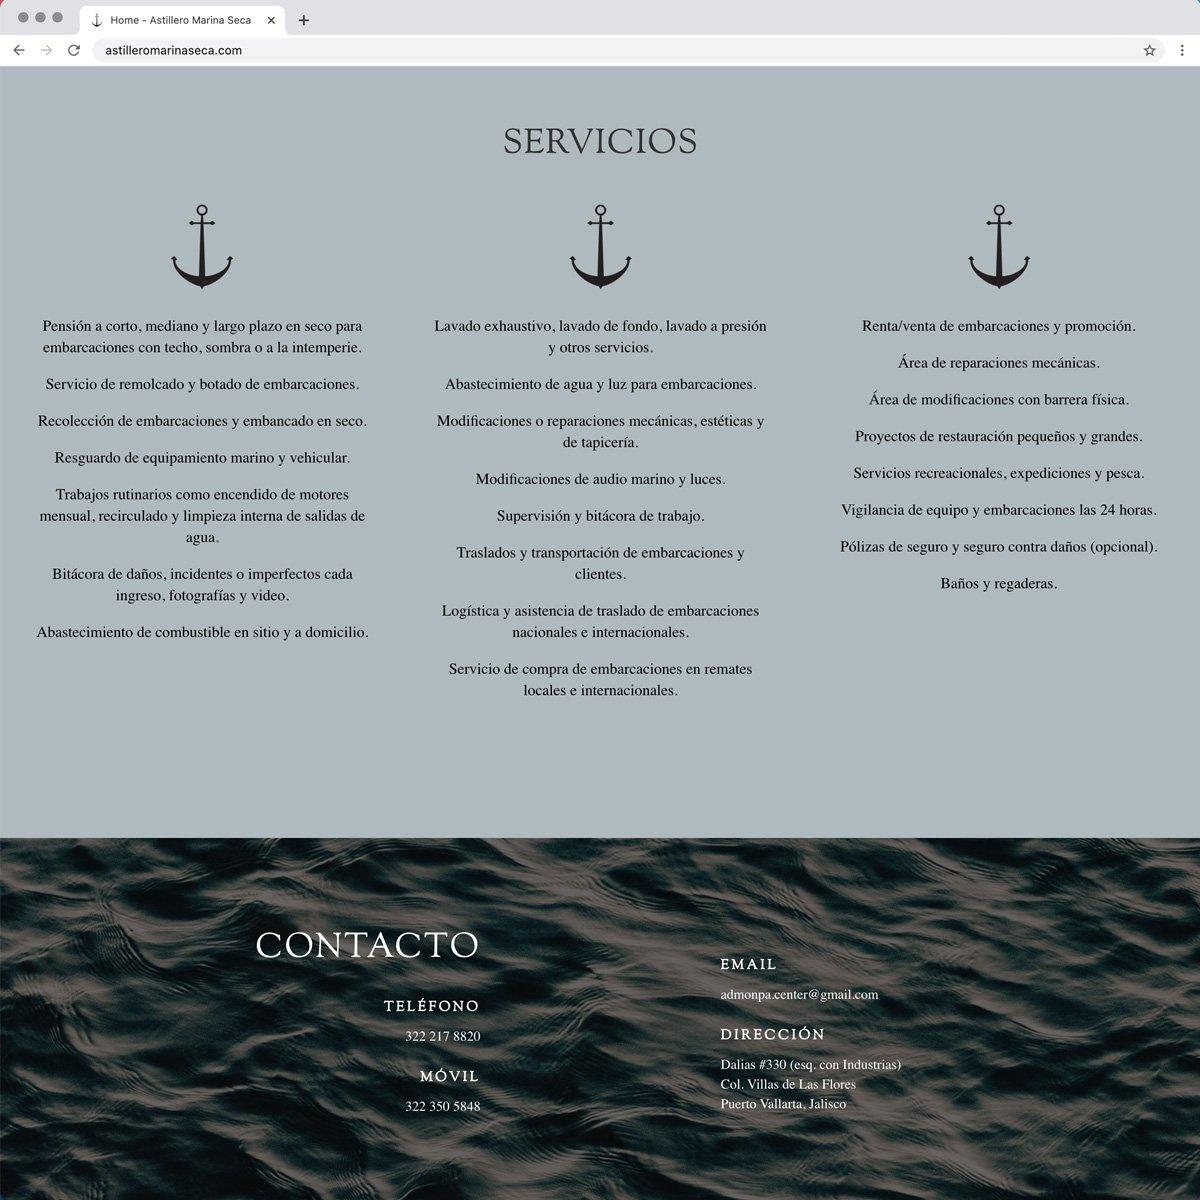 Astillero Marina Seca Web Design - Desktop